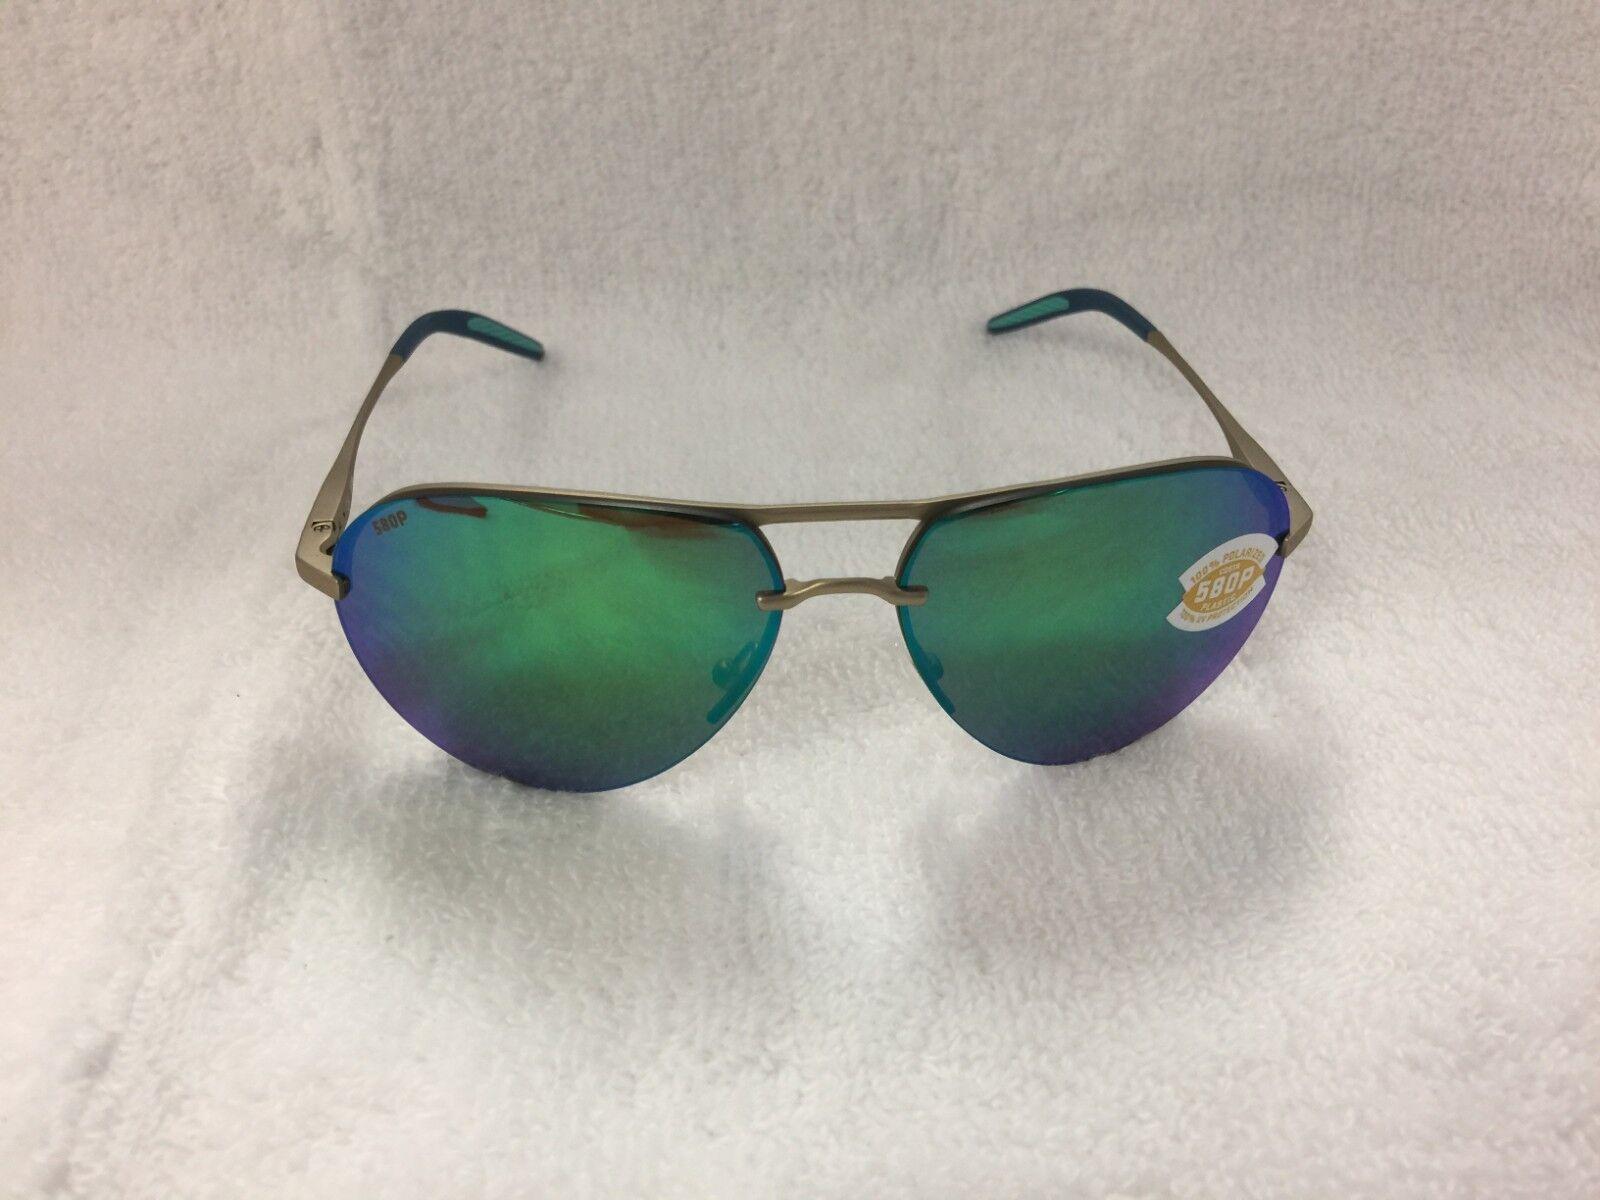 fbaf107ba9 Costa Del Mar Helo Polarized Sunglasses Champagne Green HLO 243 OGMP ...